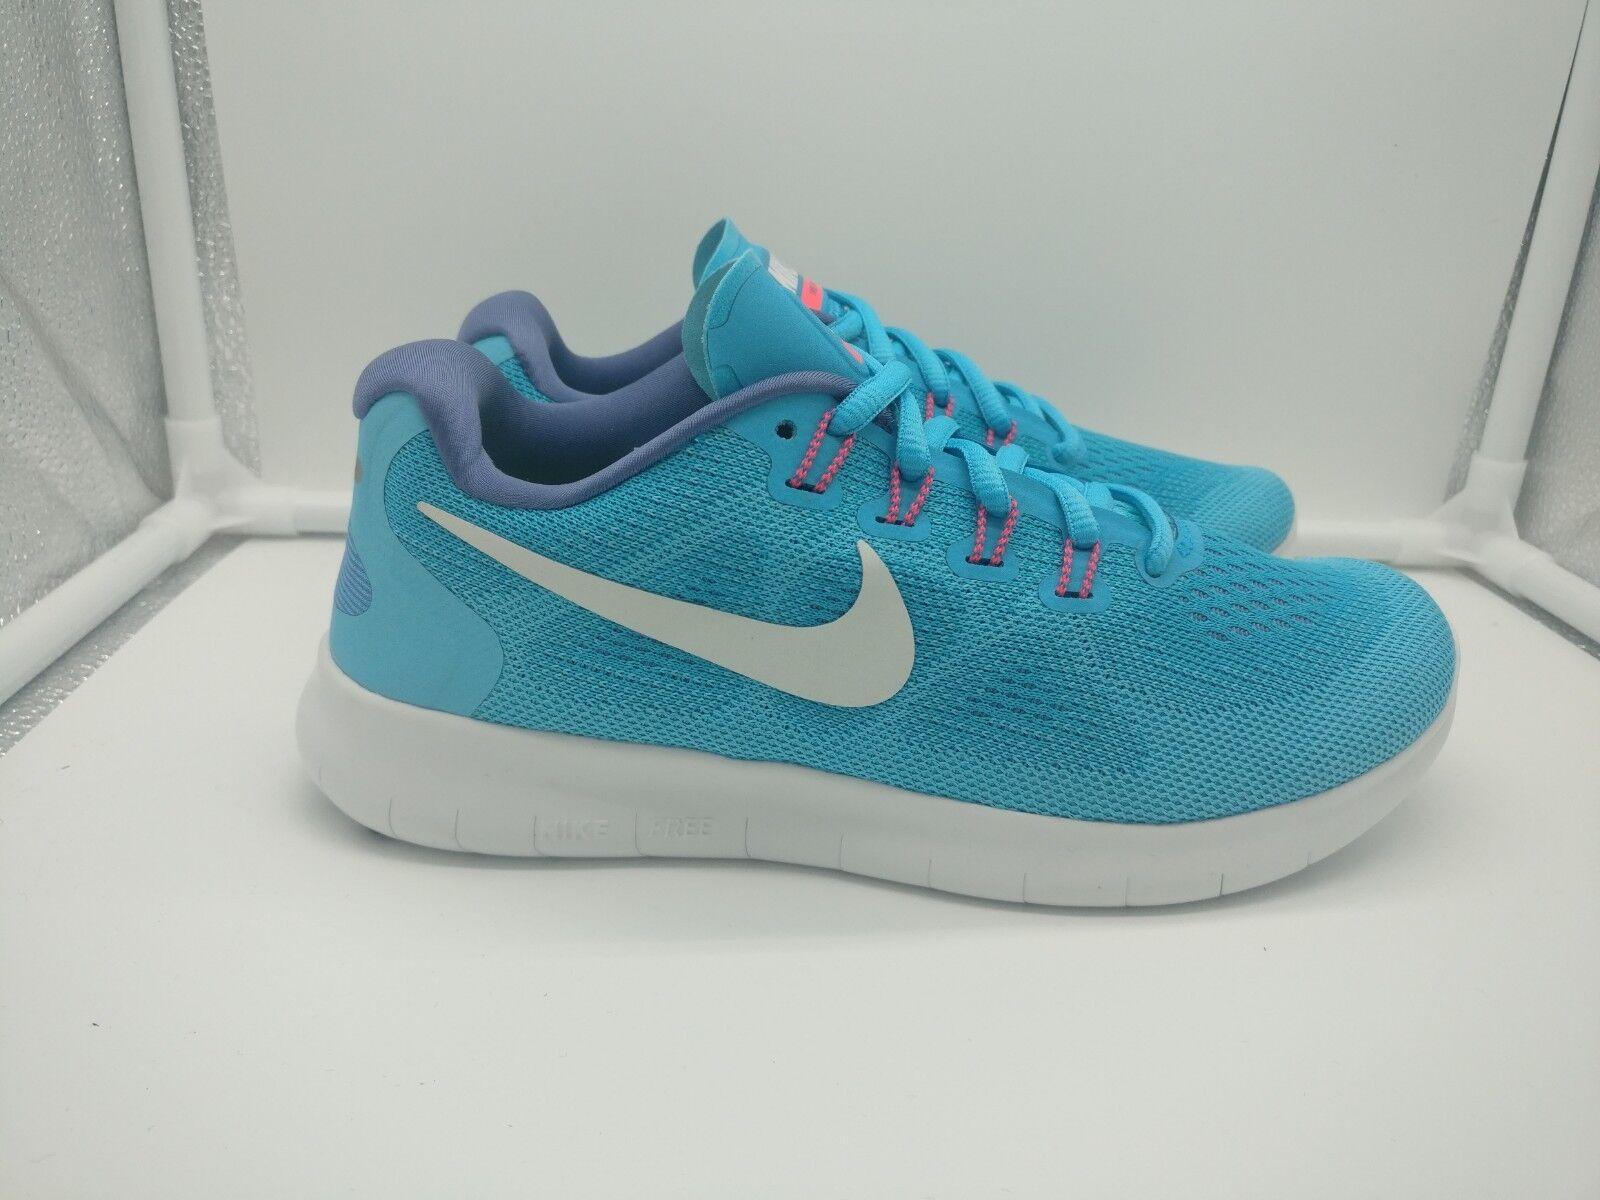 Nike Nike Nike de mujer libre rn 2017 ejecutar Reino Unido 2.5 Azul cloro blancoo Apagado 880840-400  Venta barata